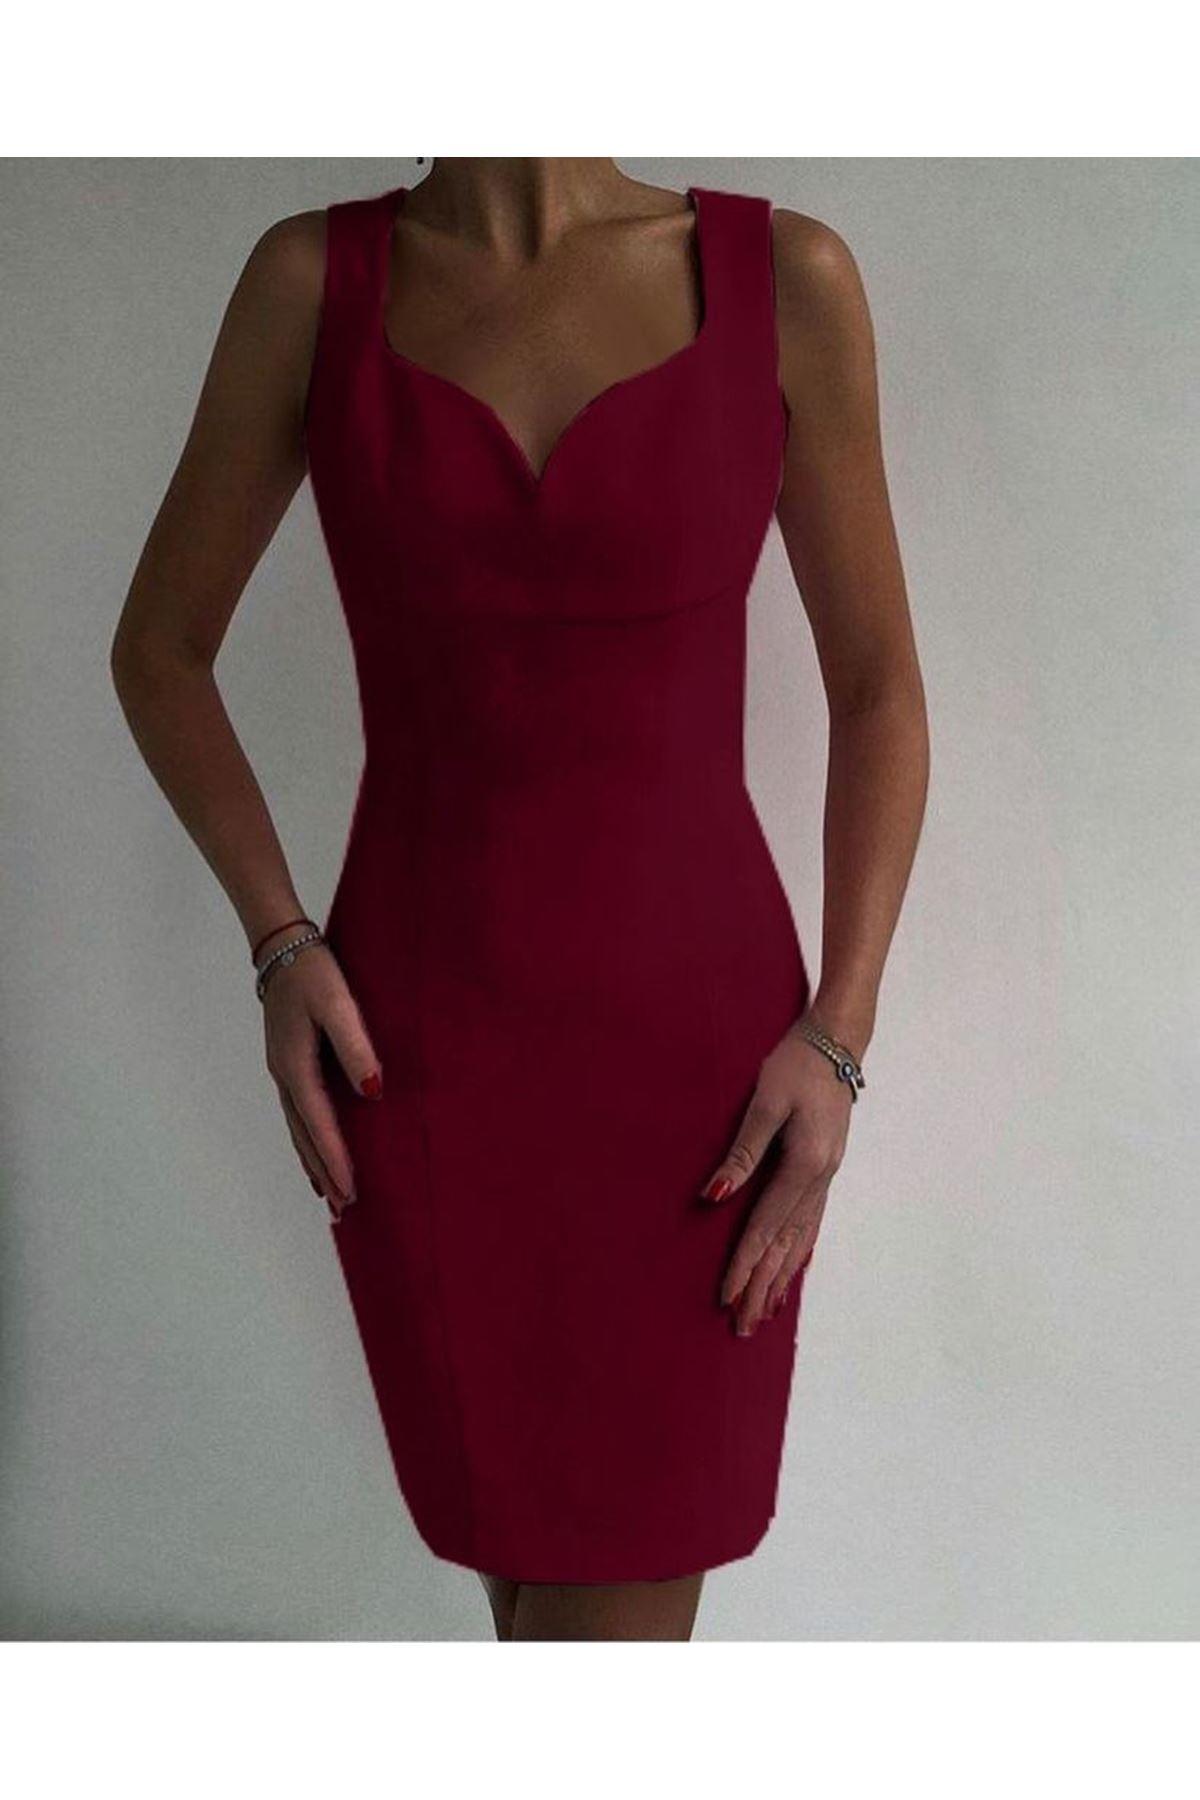 Kalp Yaka Scuba Elbise - BORDO